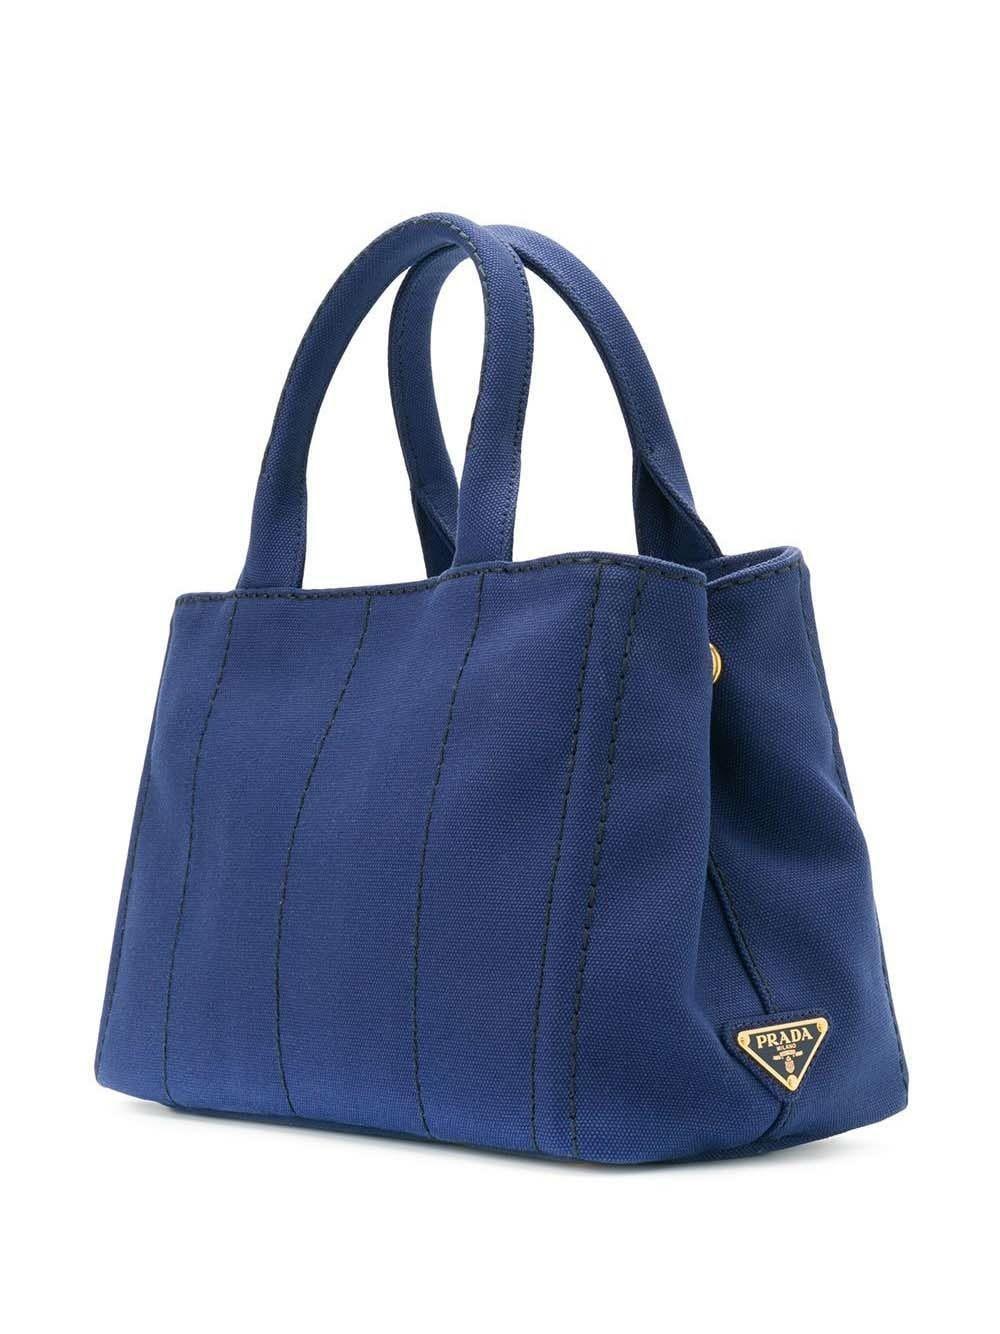 Prada Cotton Logo Print Tote Bag in Blue